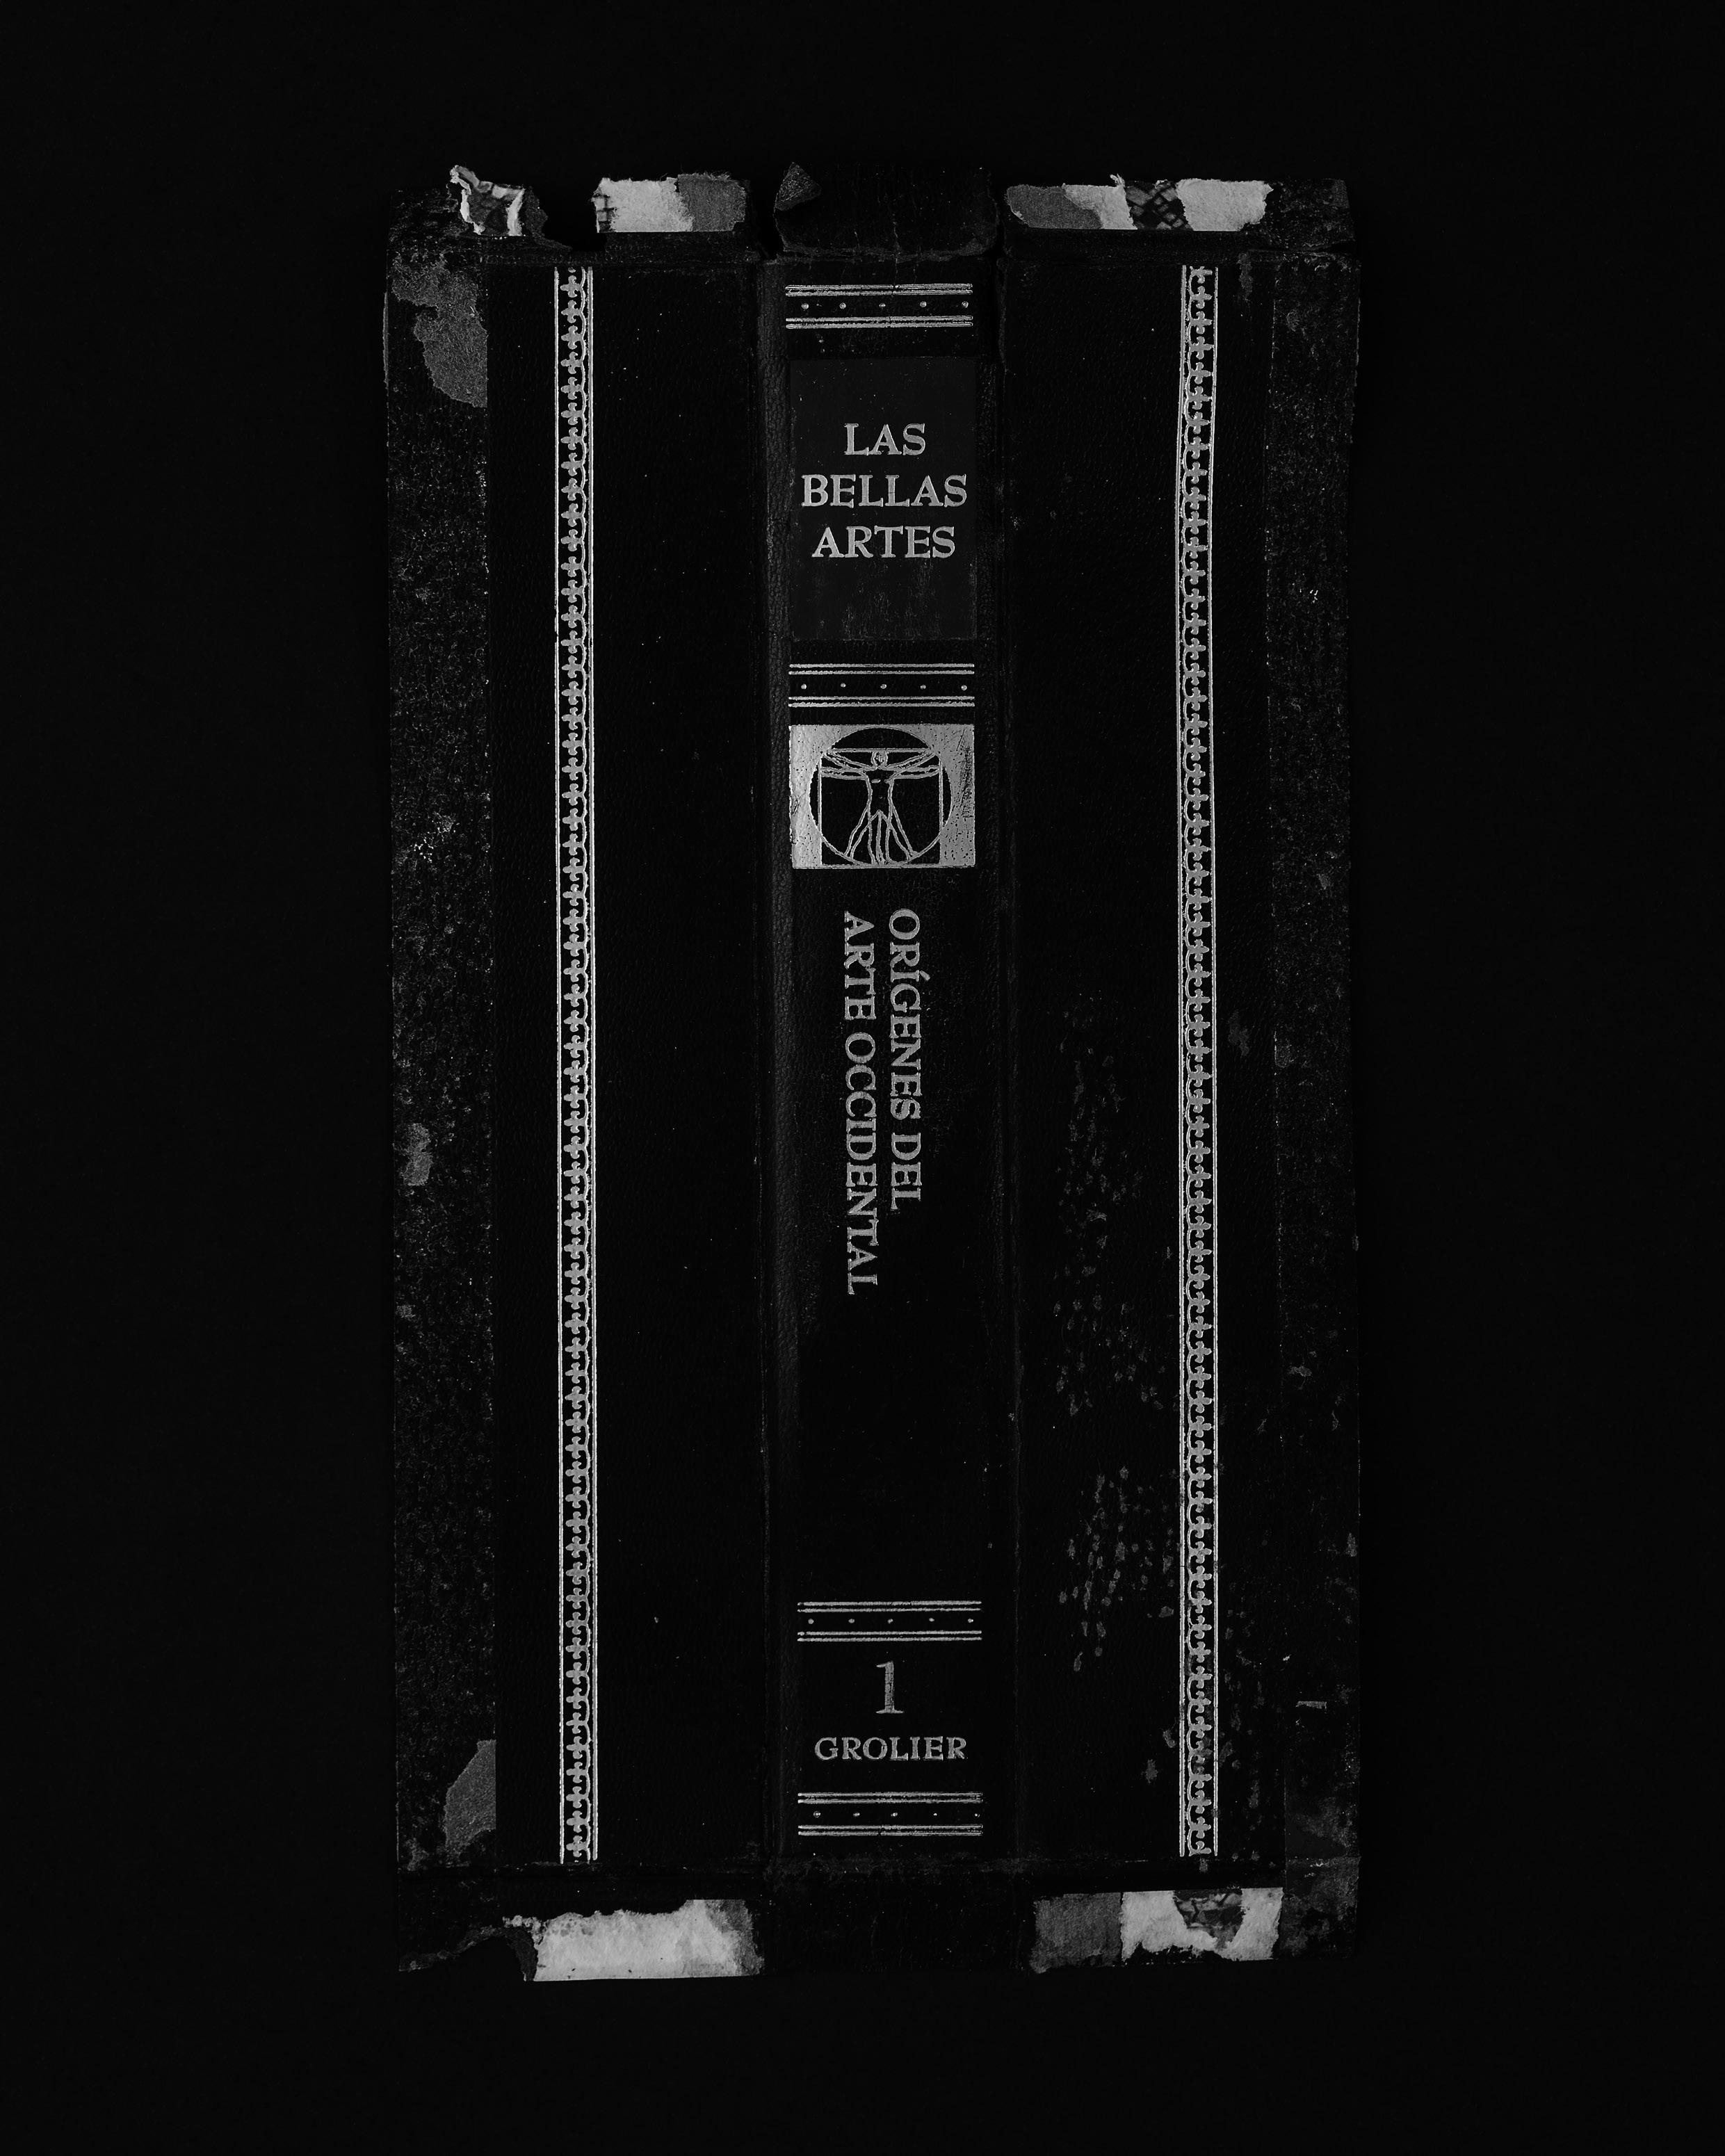 Grolier 01 - Orígenes del arte occidental